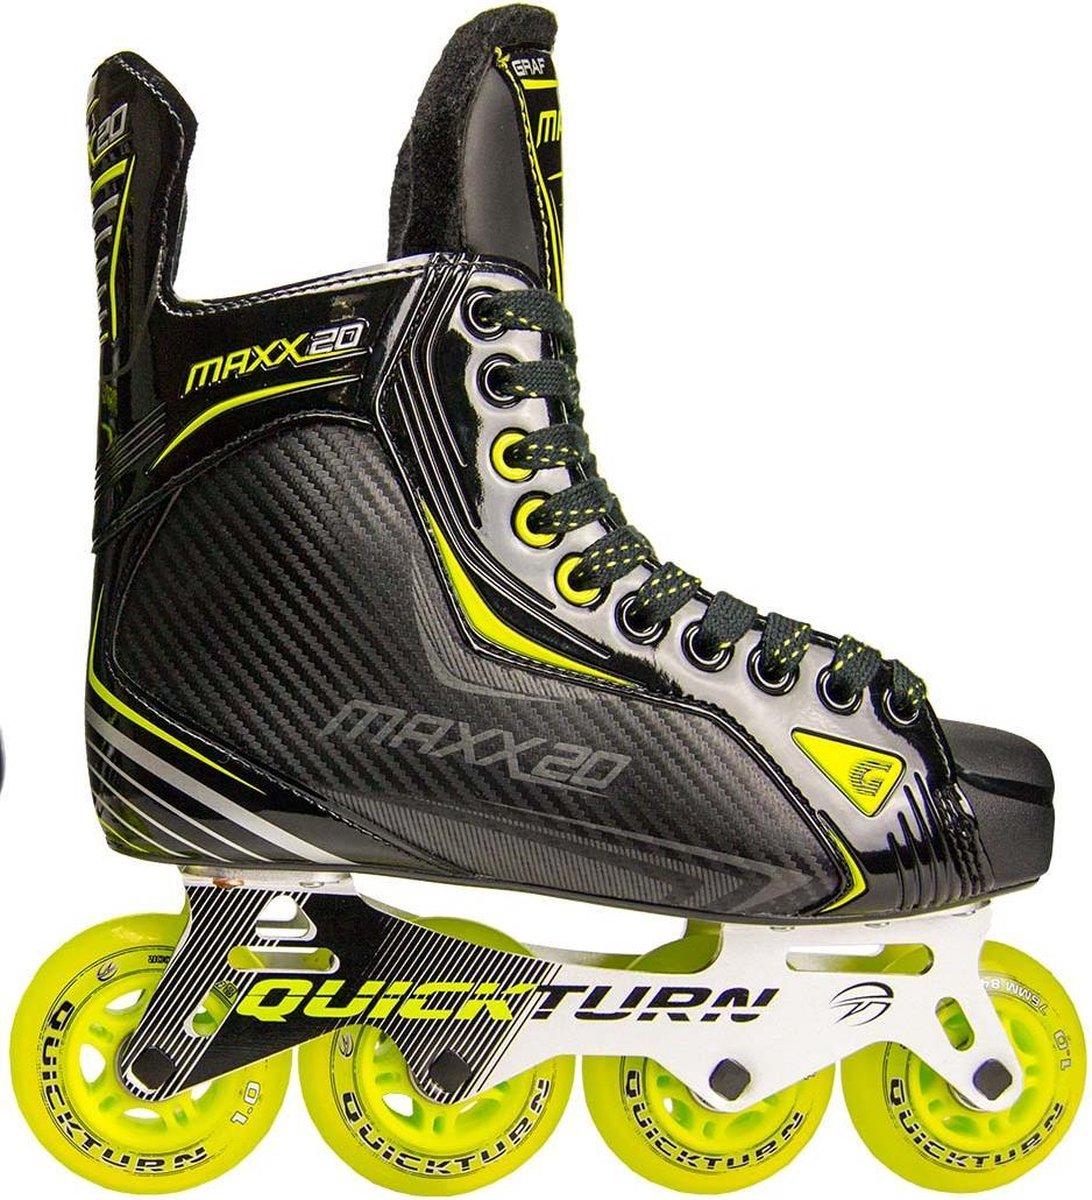 Streethockey inlineskate Graf Maxx 20 inliner maat 36